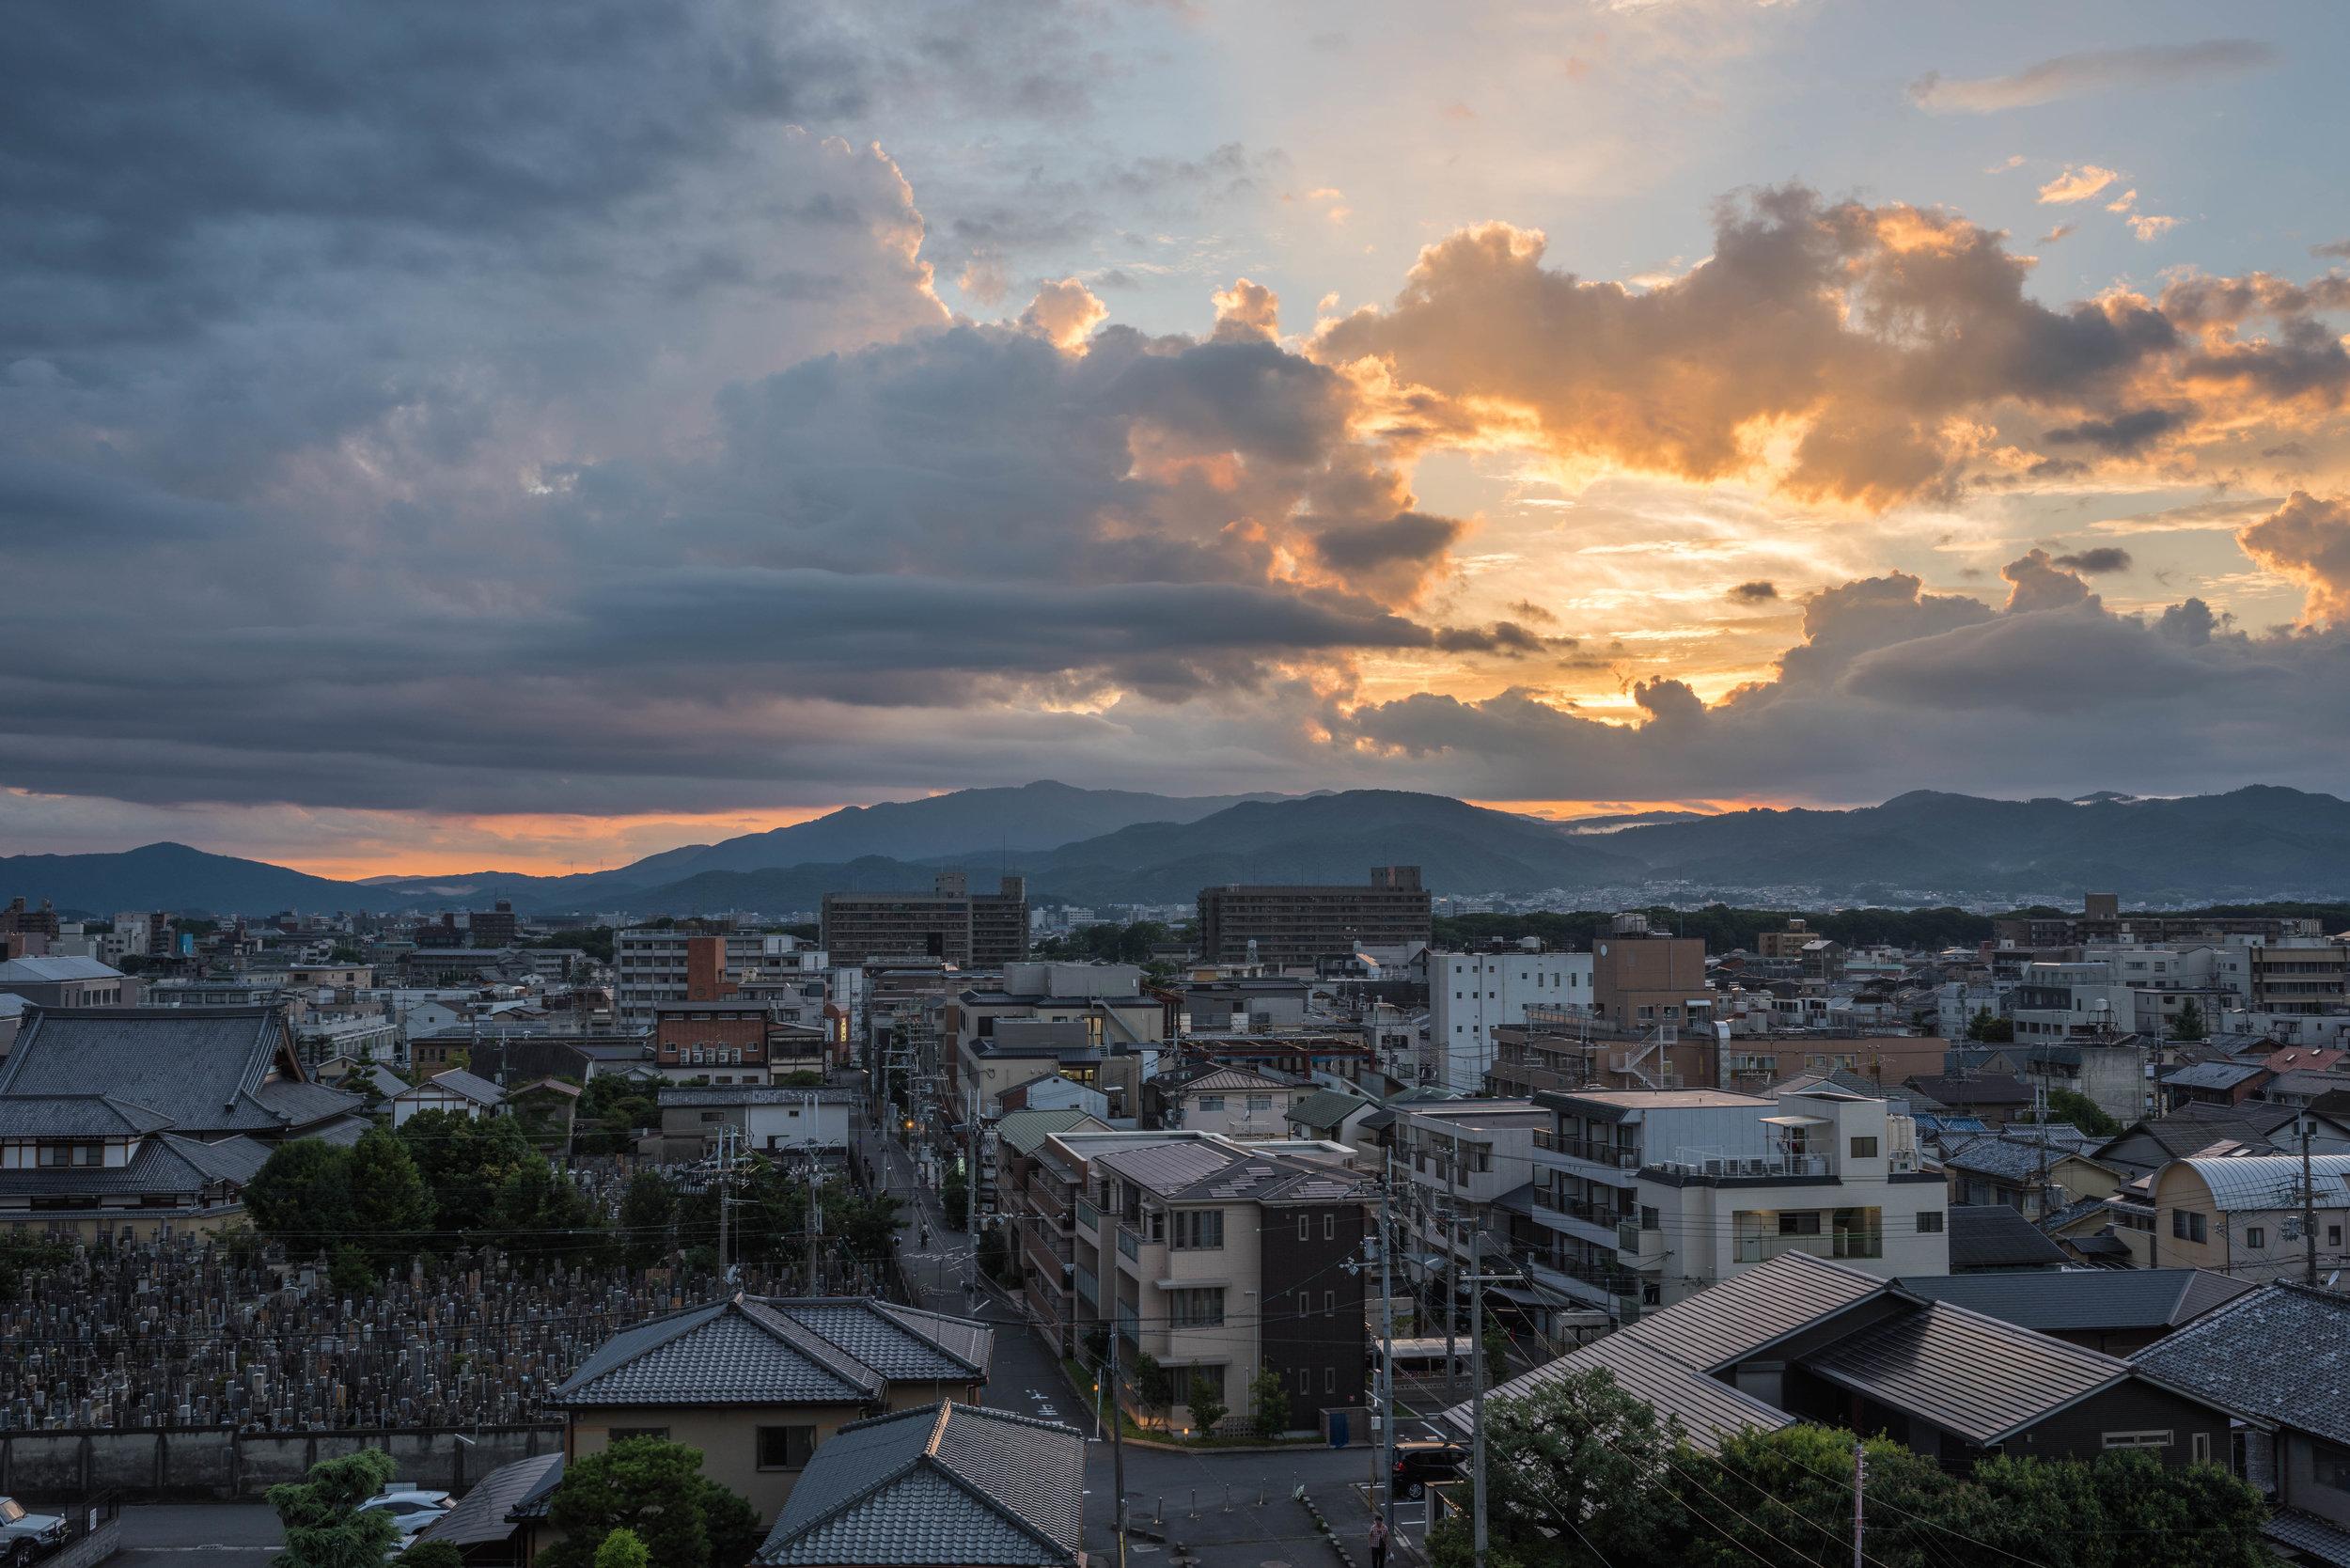 Kyoto, Japan (2018)